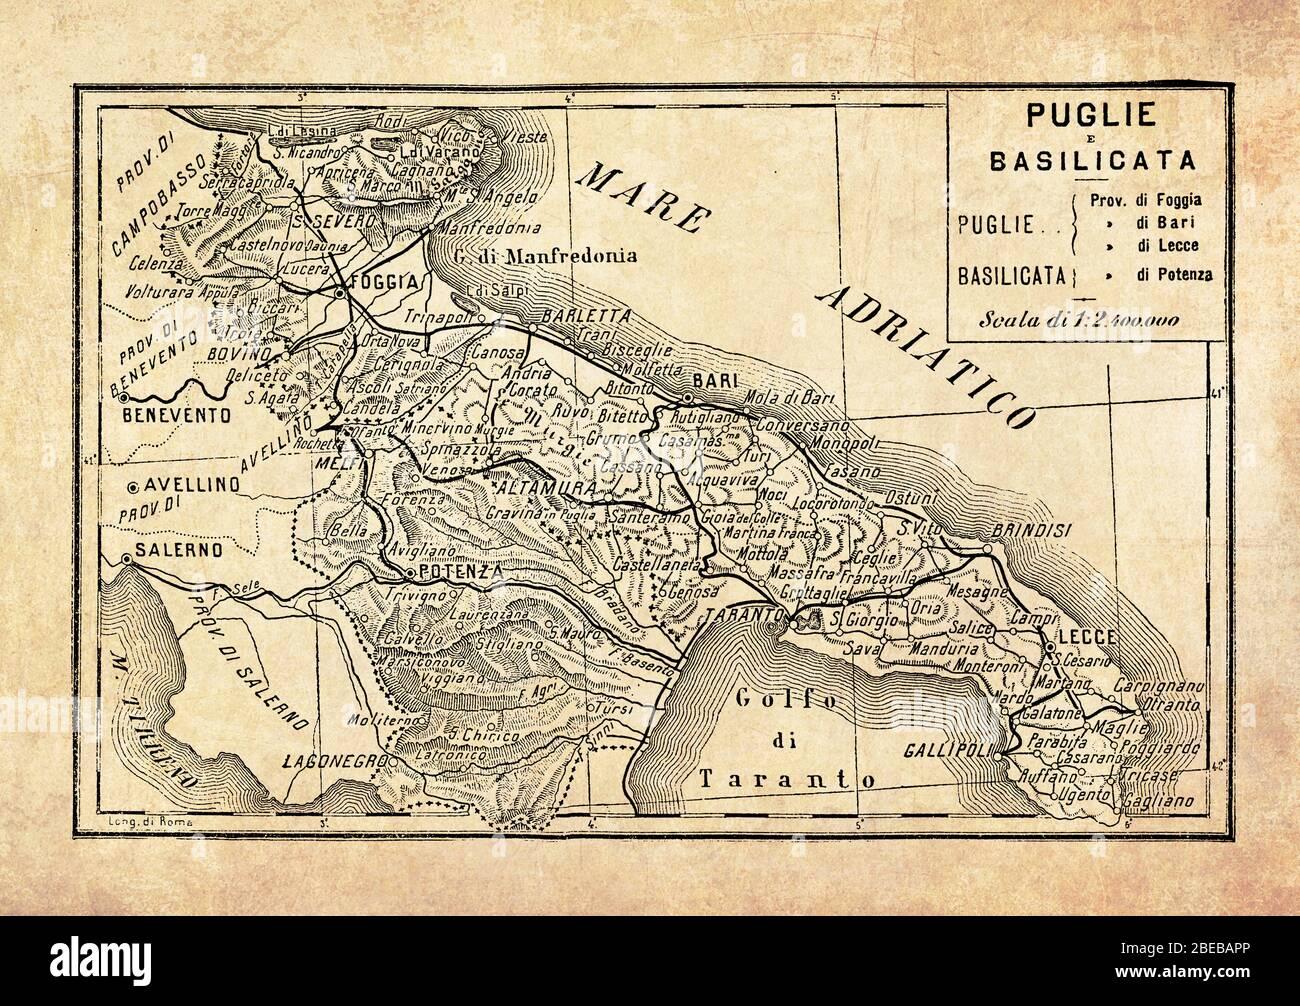 Mappa Puglia E Basilicata.Mappa Basilicata Immagini E Fotos Stock Alamy